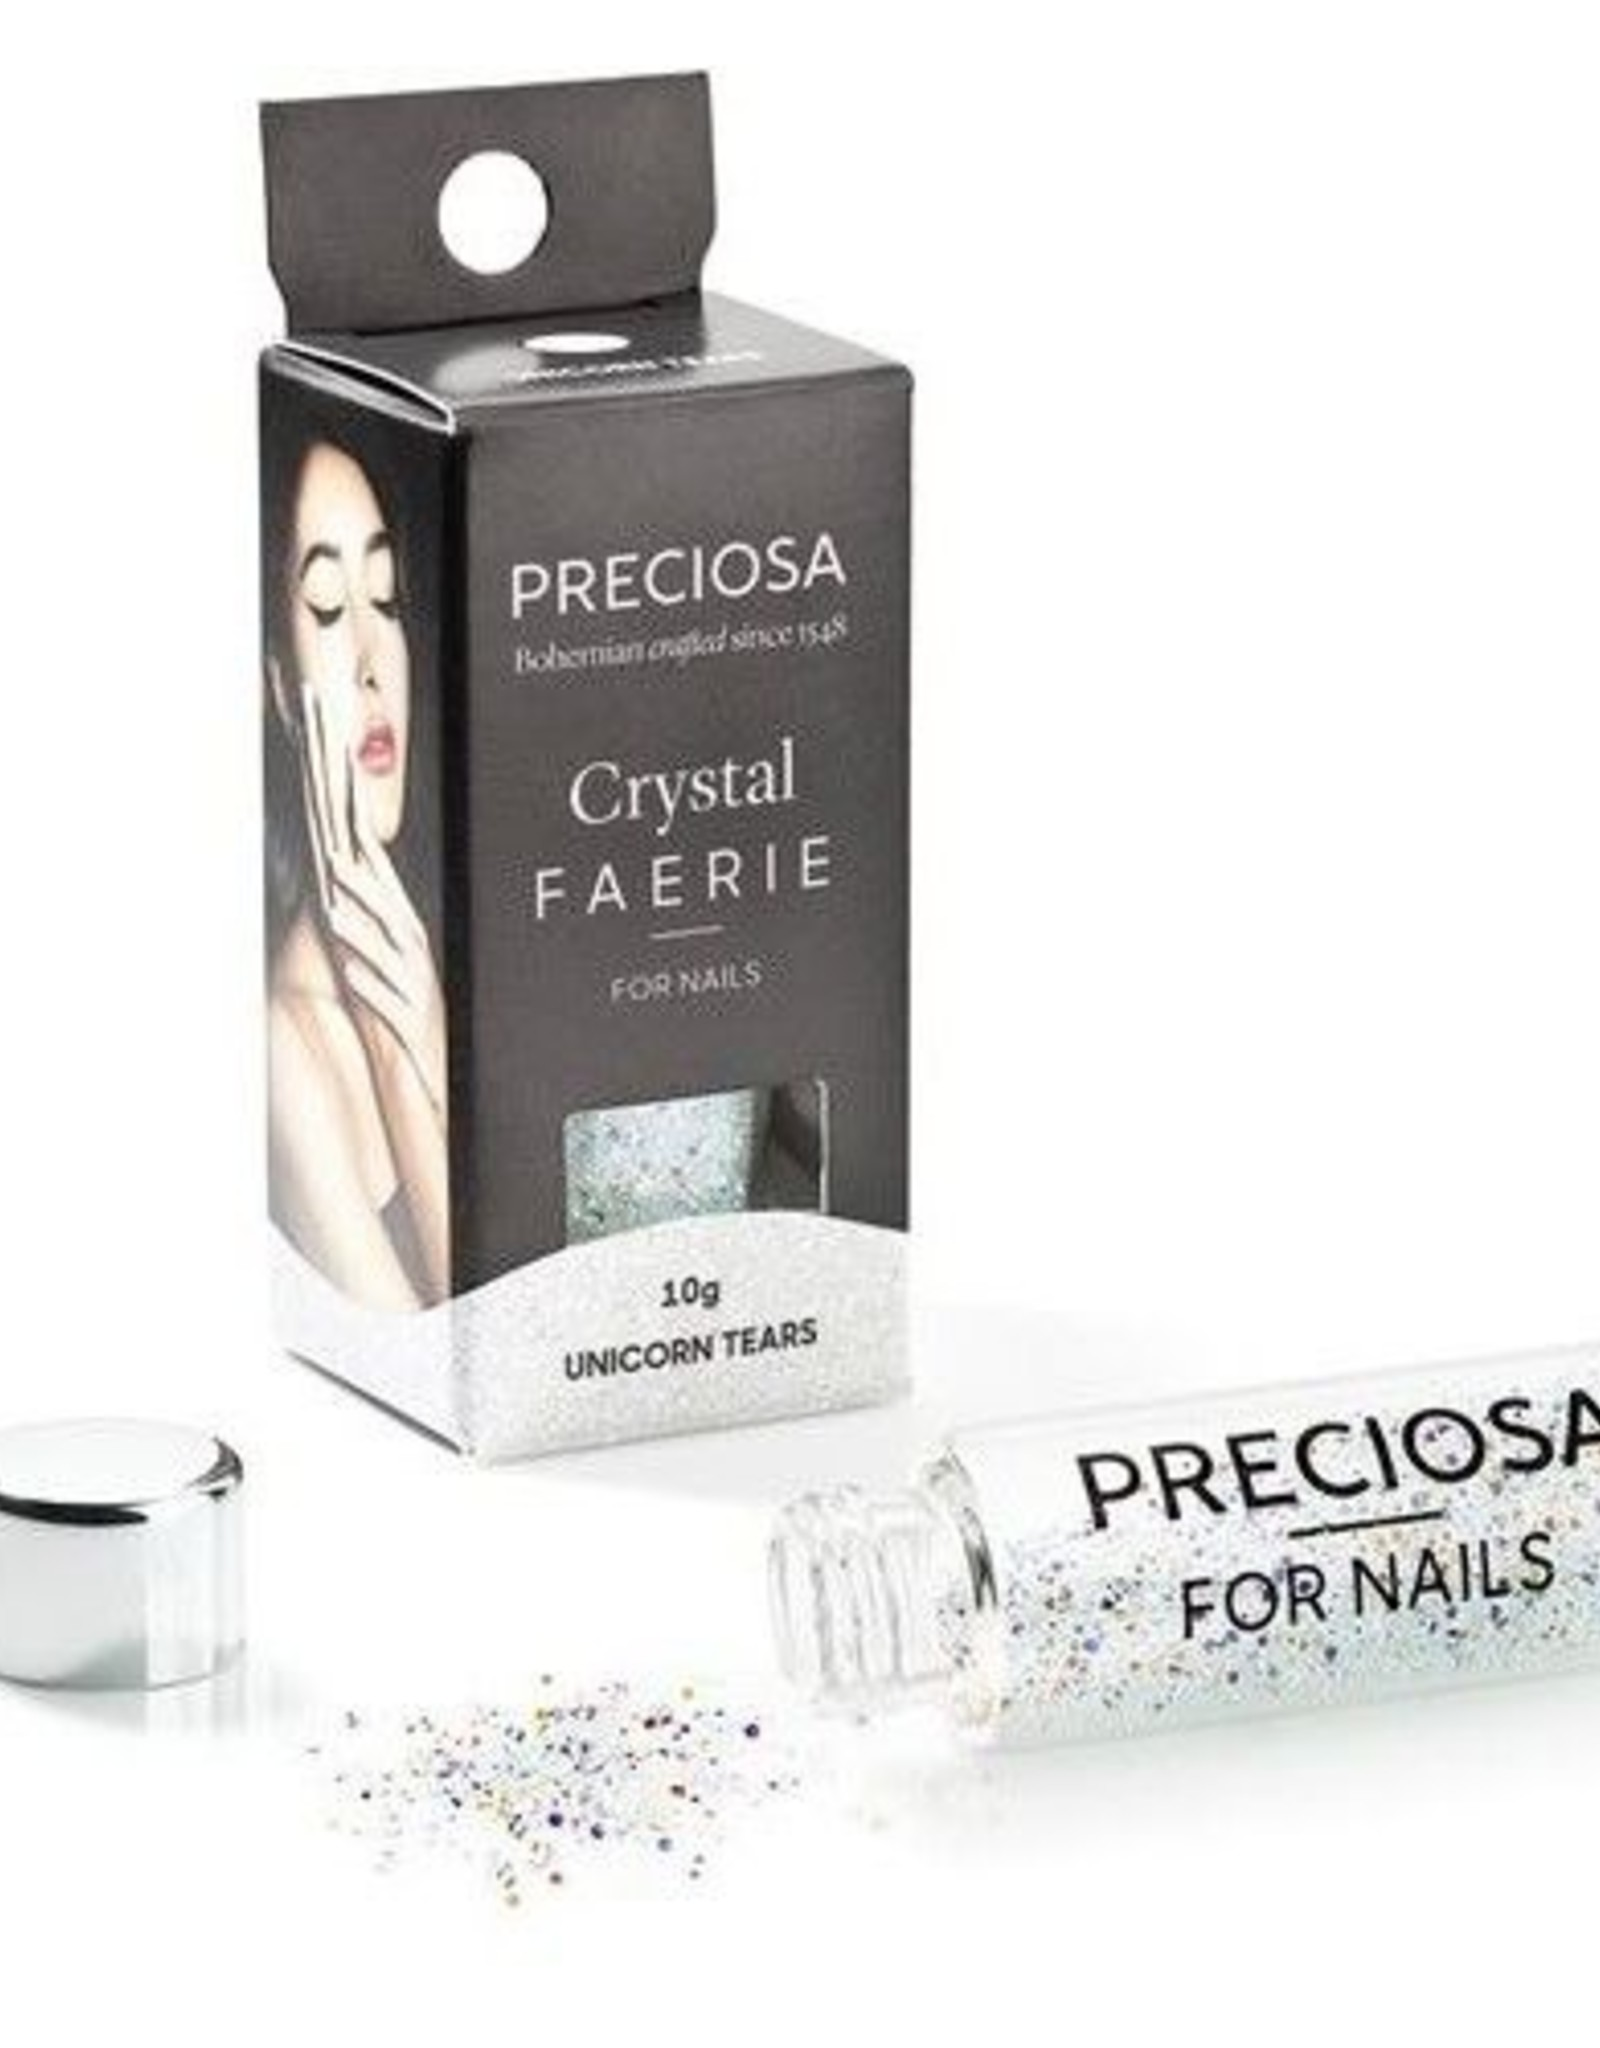 Preciosa Crystal Faerie Unicorn Tears